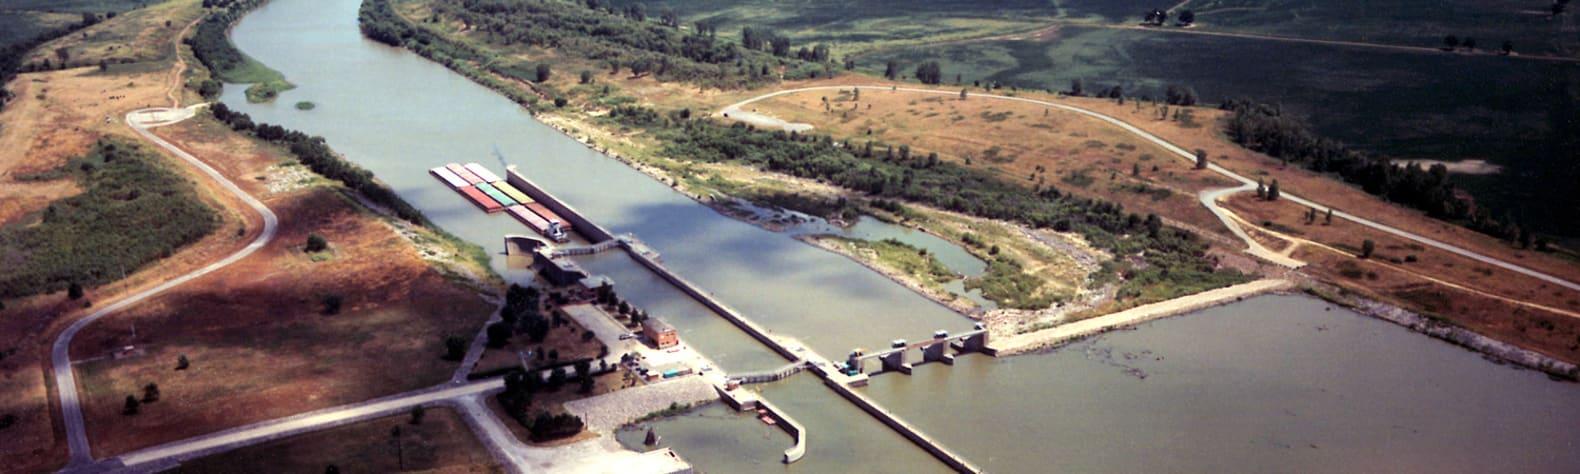 Arkansas River - Newt Graham Pool